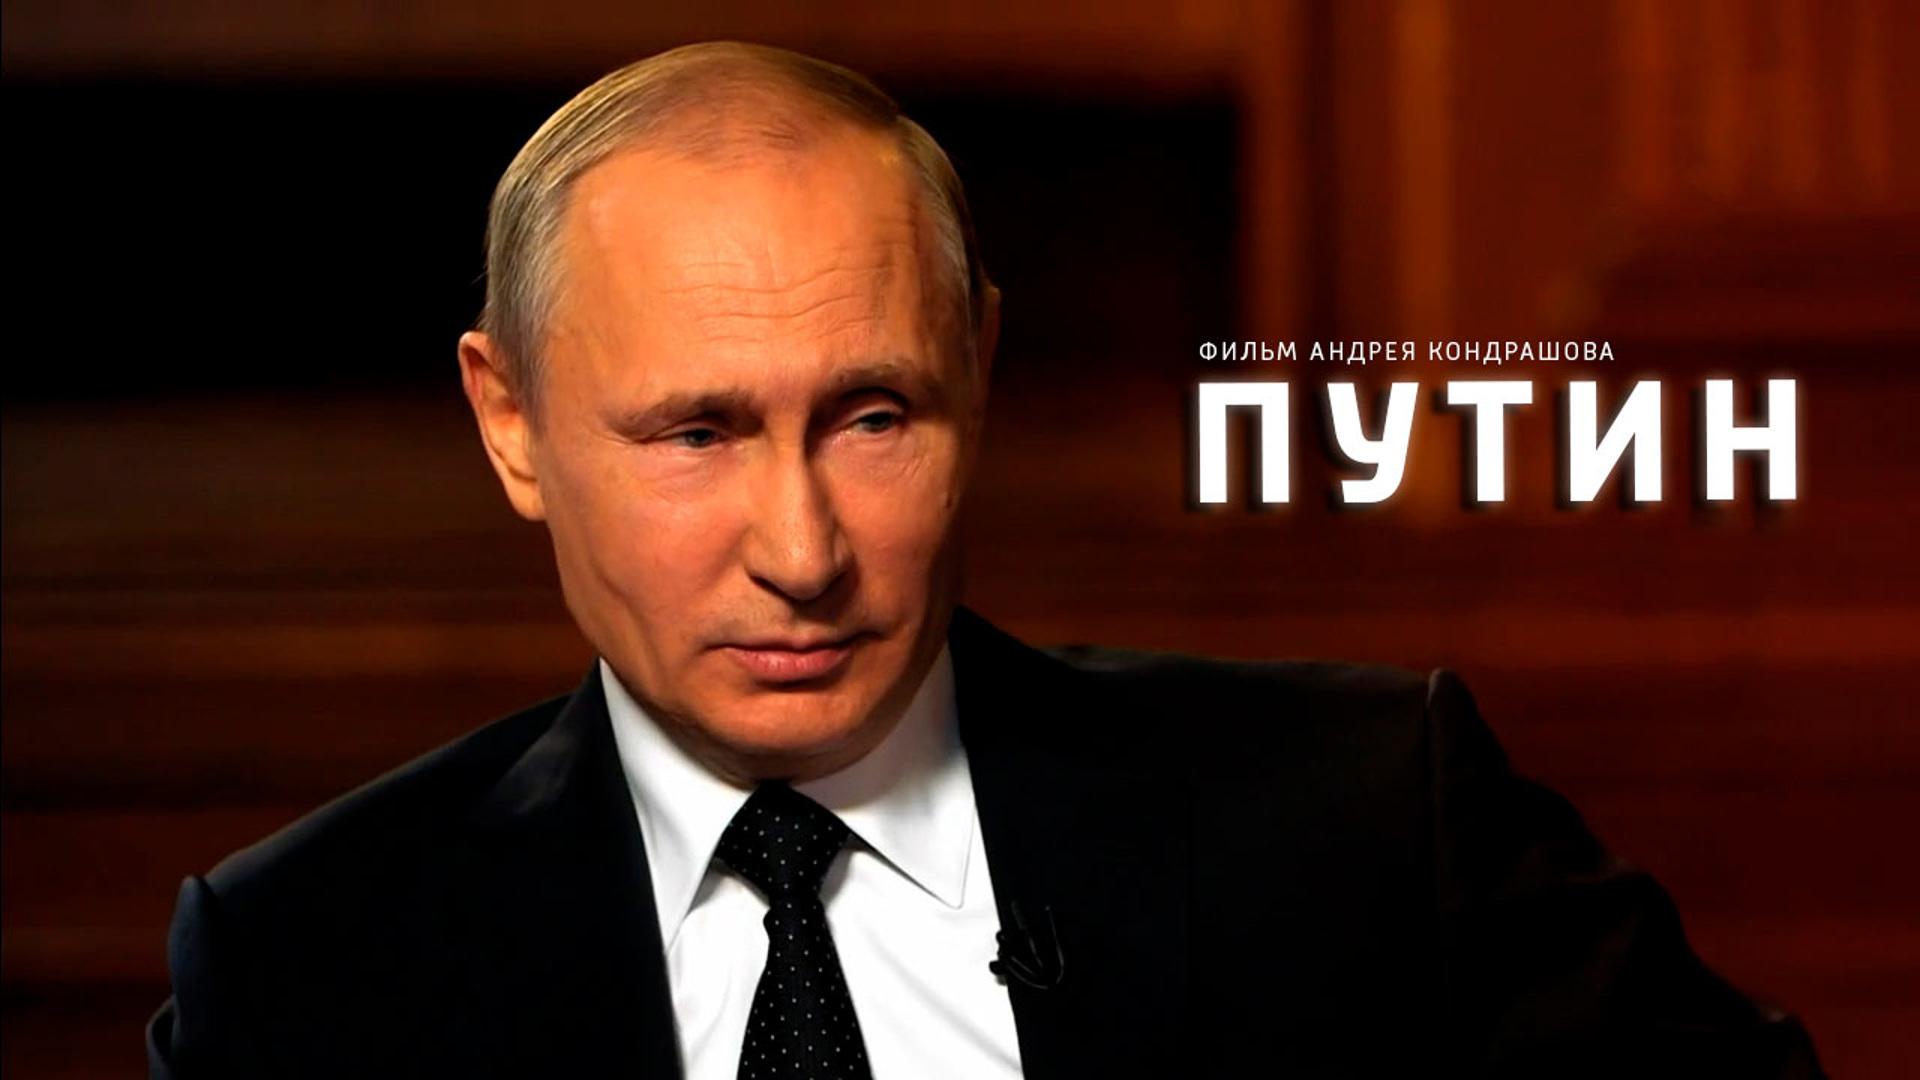 Путин. Фильм Андрея Кондрашова